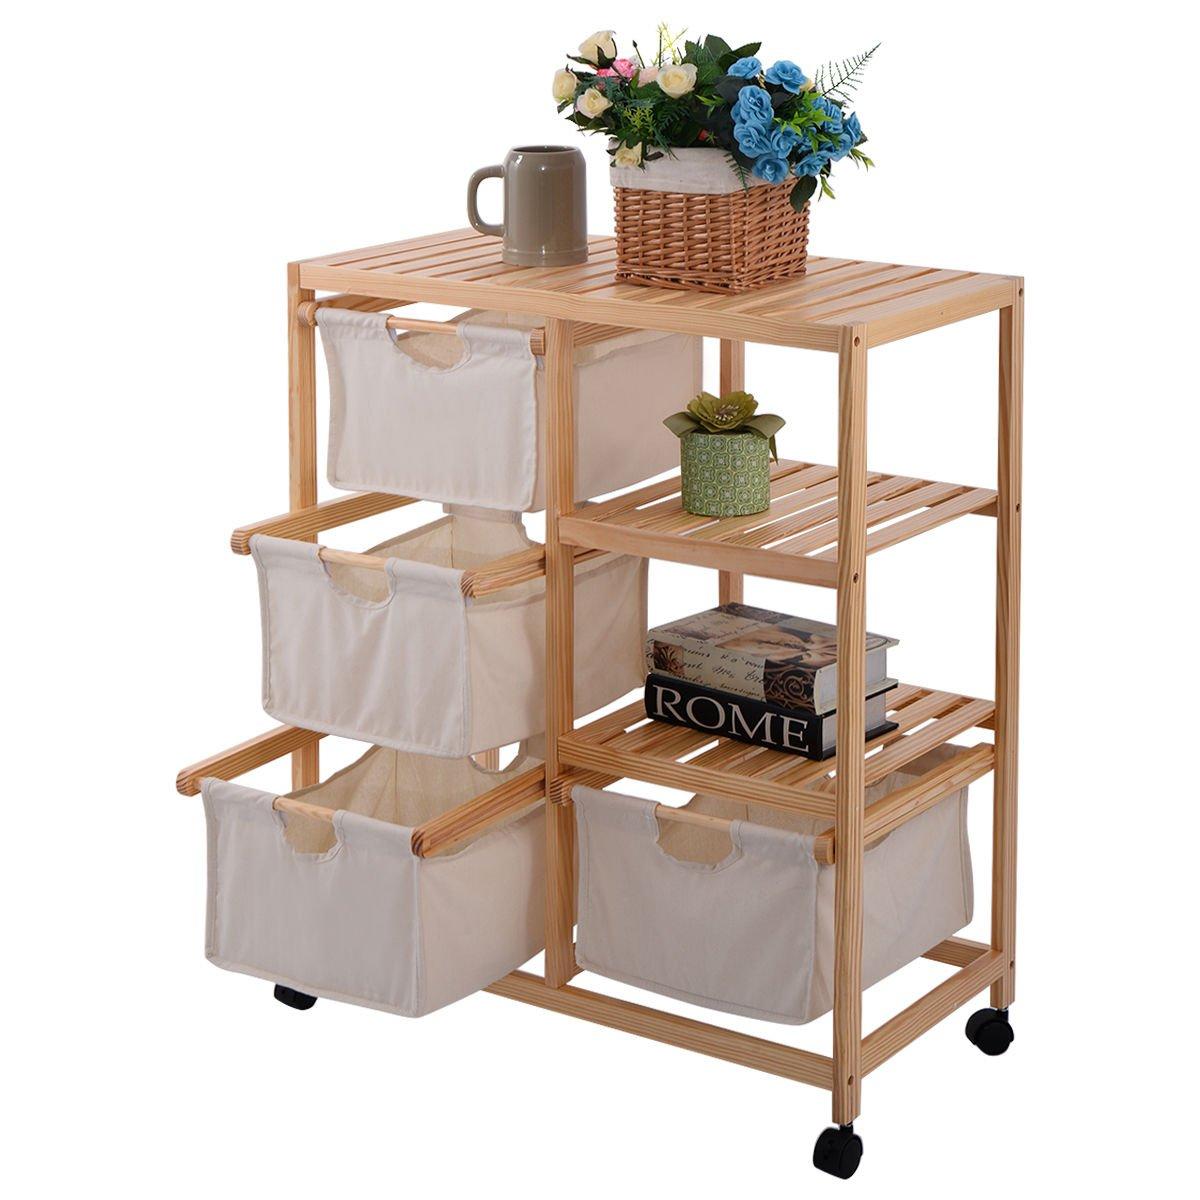 New MTN-G Wood Hamper 2 Section Storage Shelf Unit W/4 Fabric Drawers Home Furniture